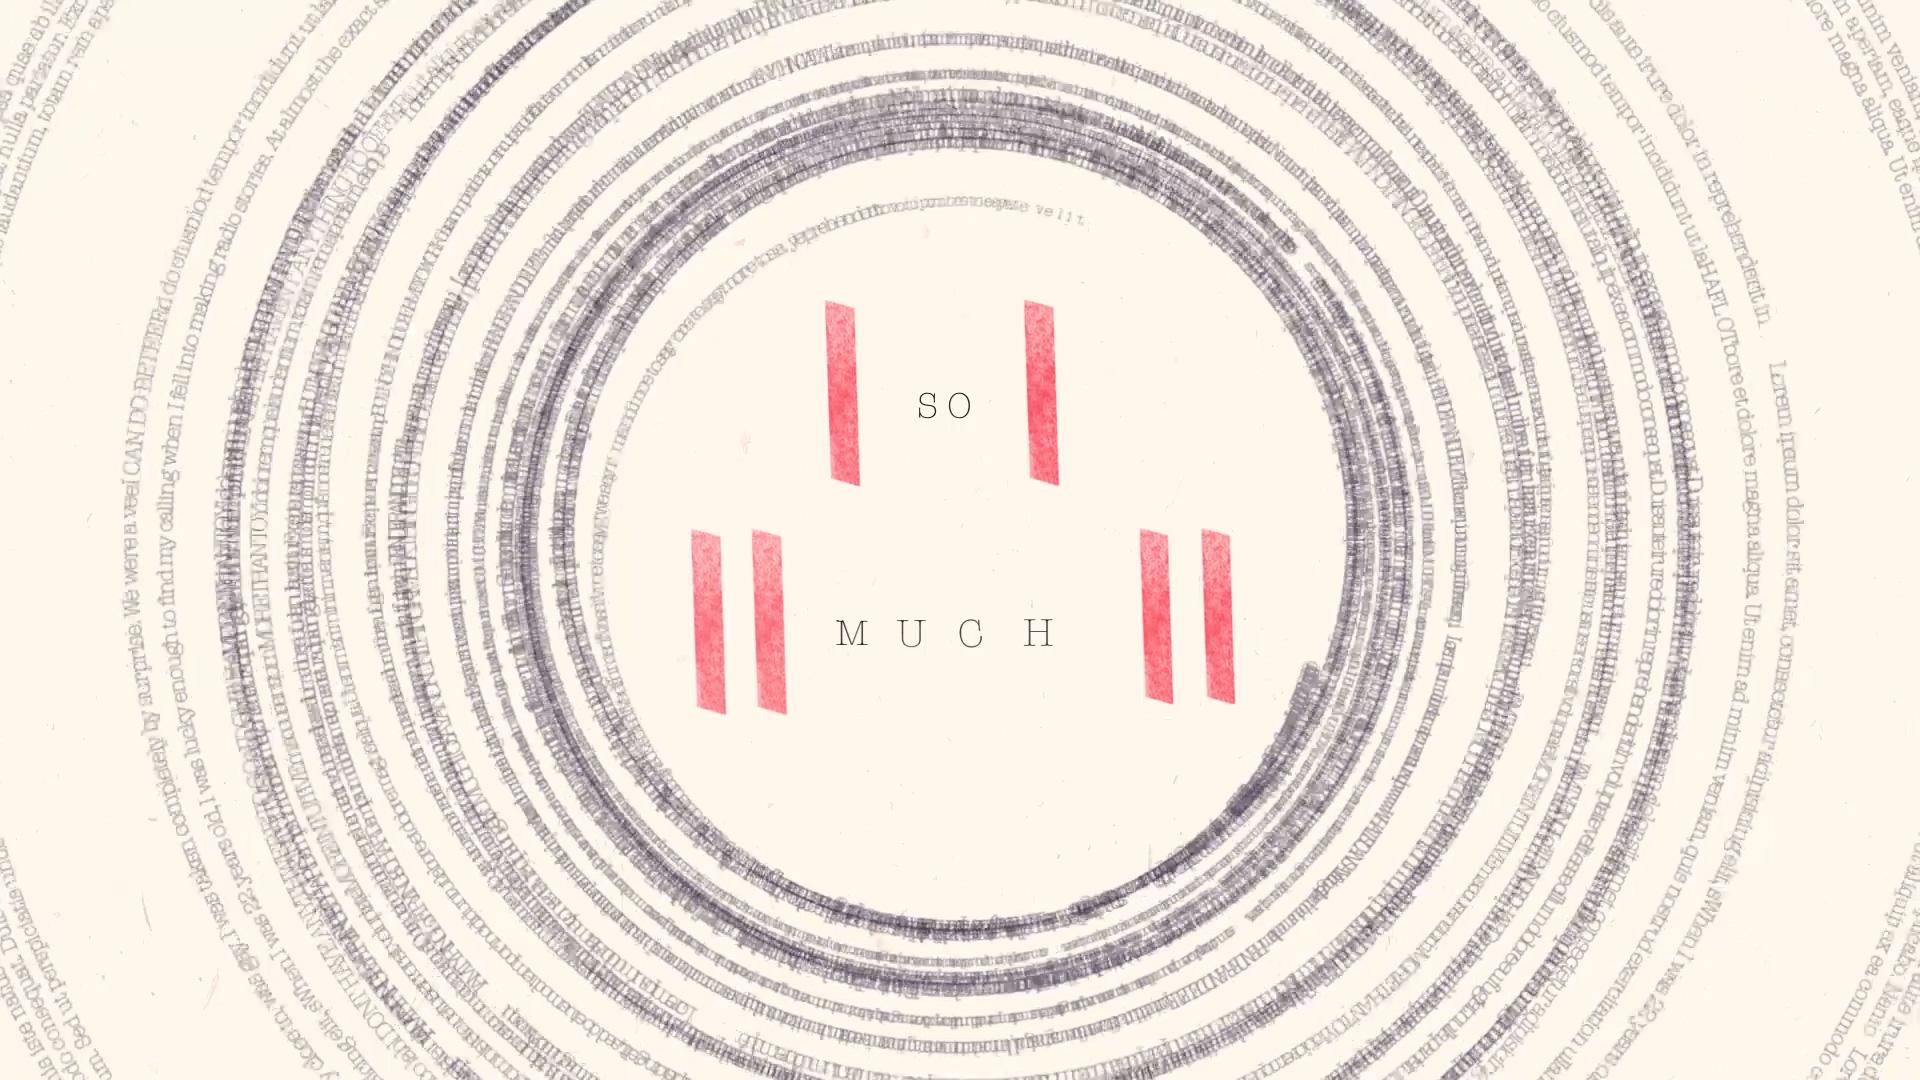 BAKRIE_ELEENA_KineticType_StoryCorps_Cover.jpg